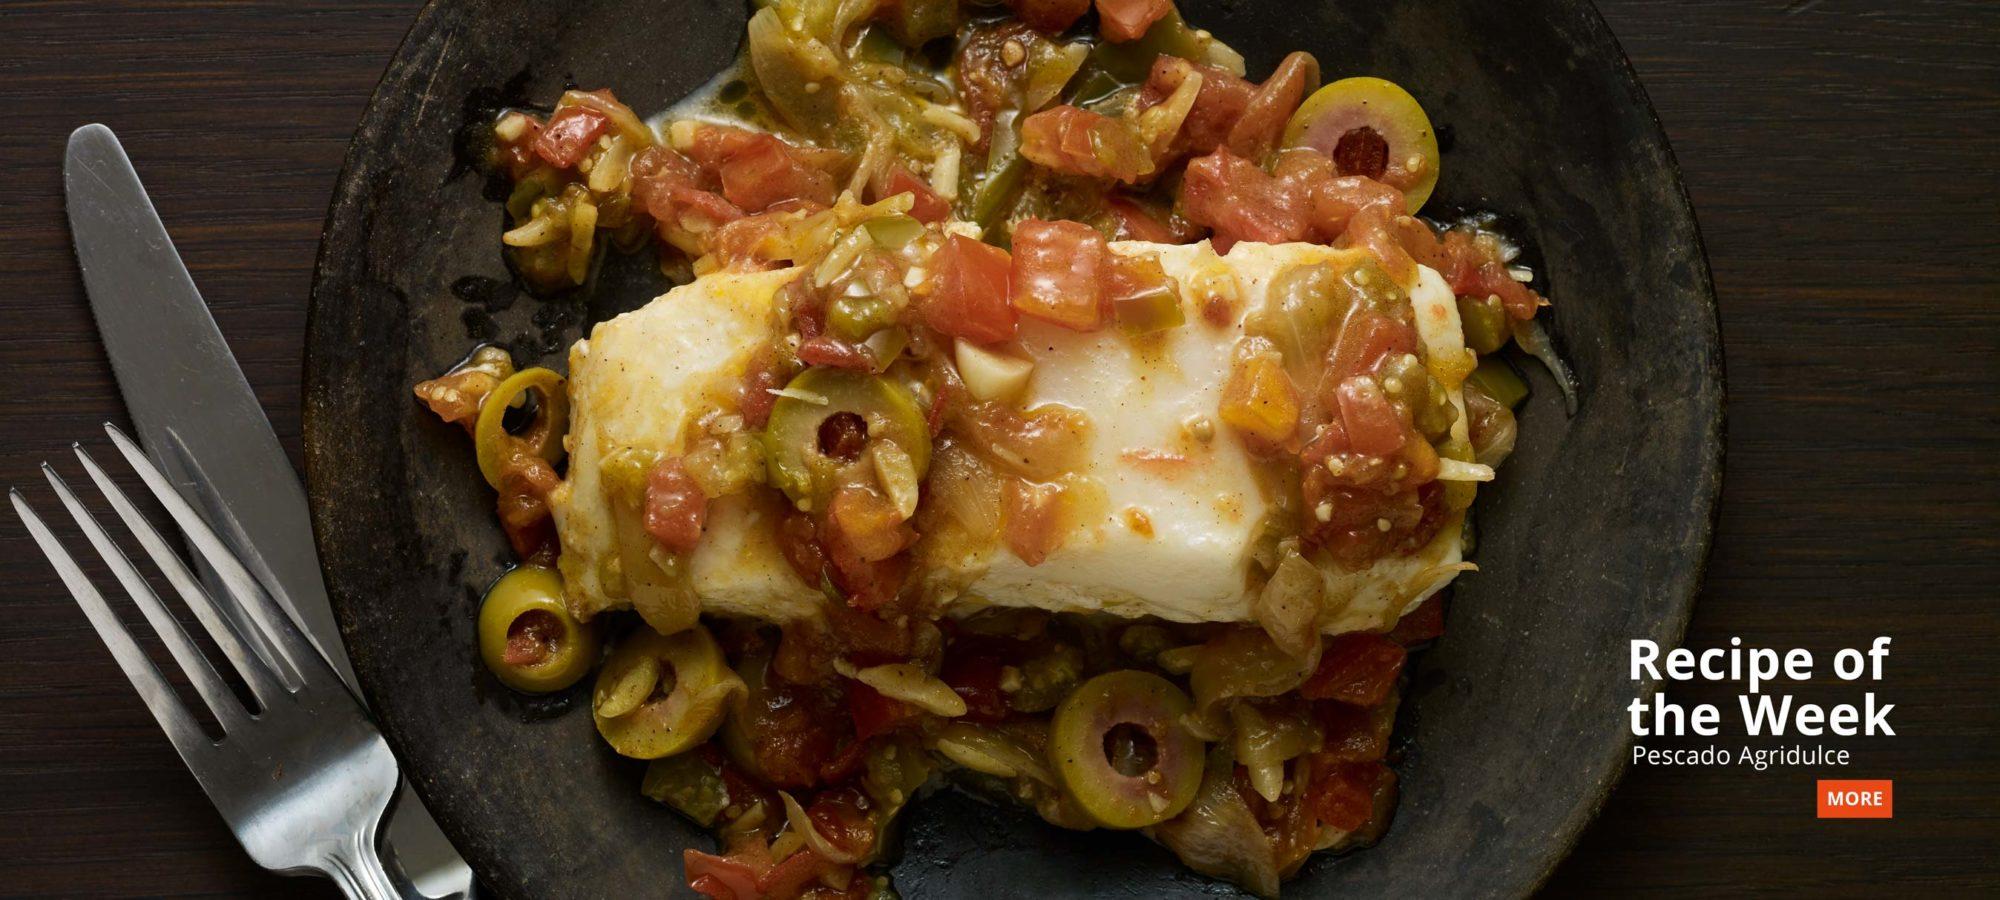 recipe of the week pescado agridulce